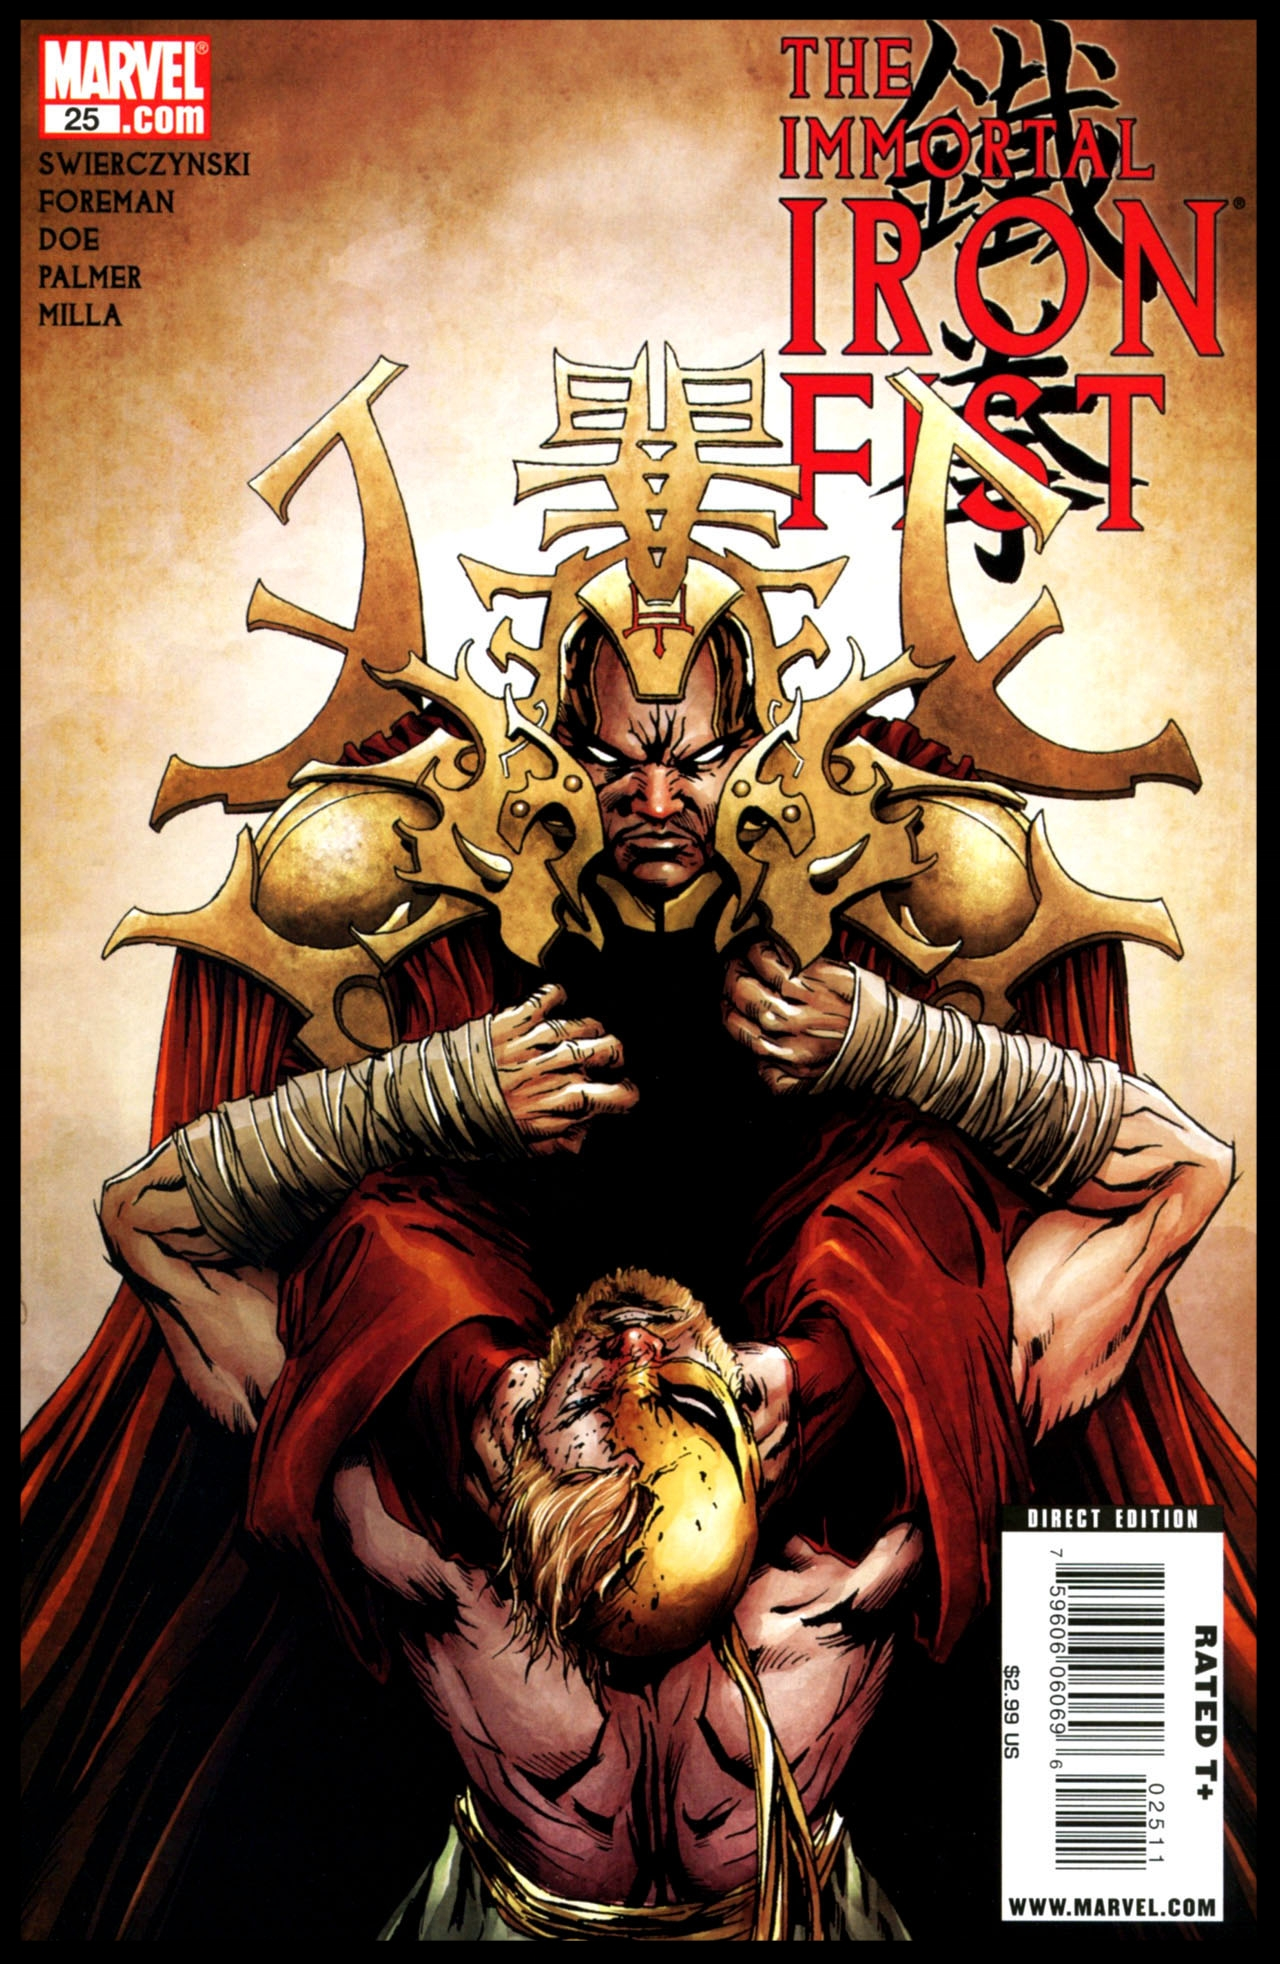 The Immortal Iron Fist #25 Cover